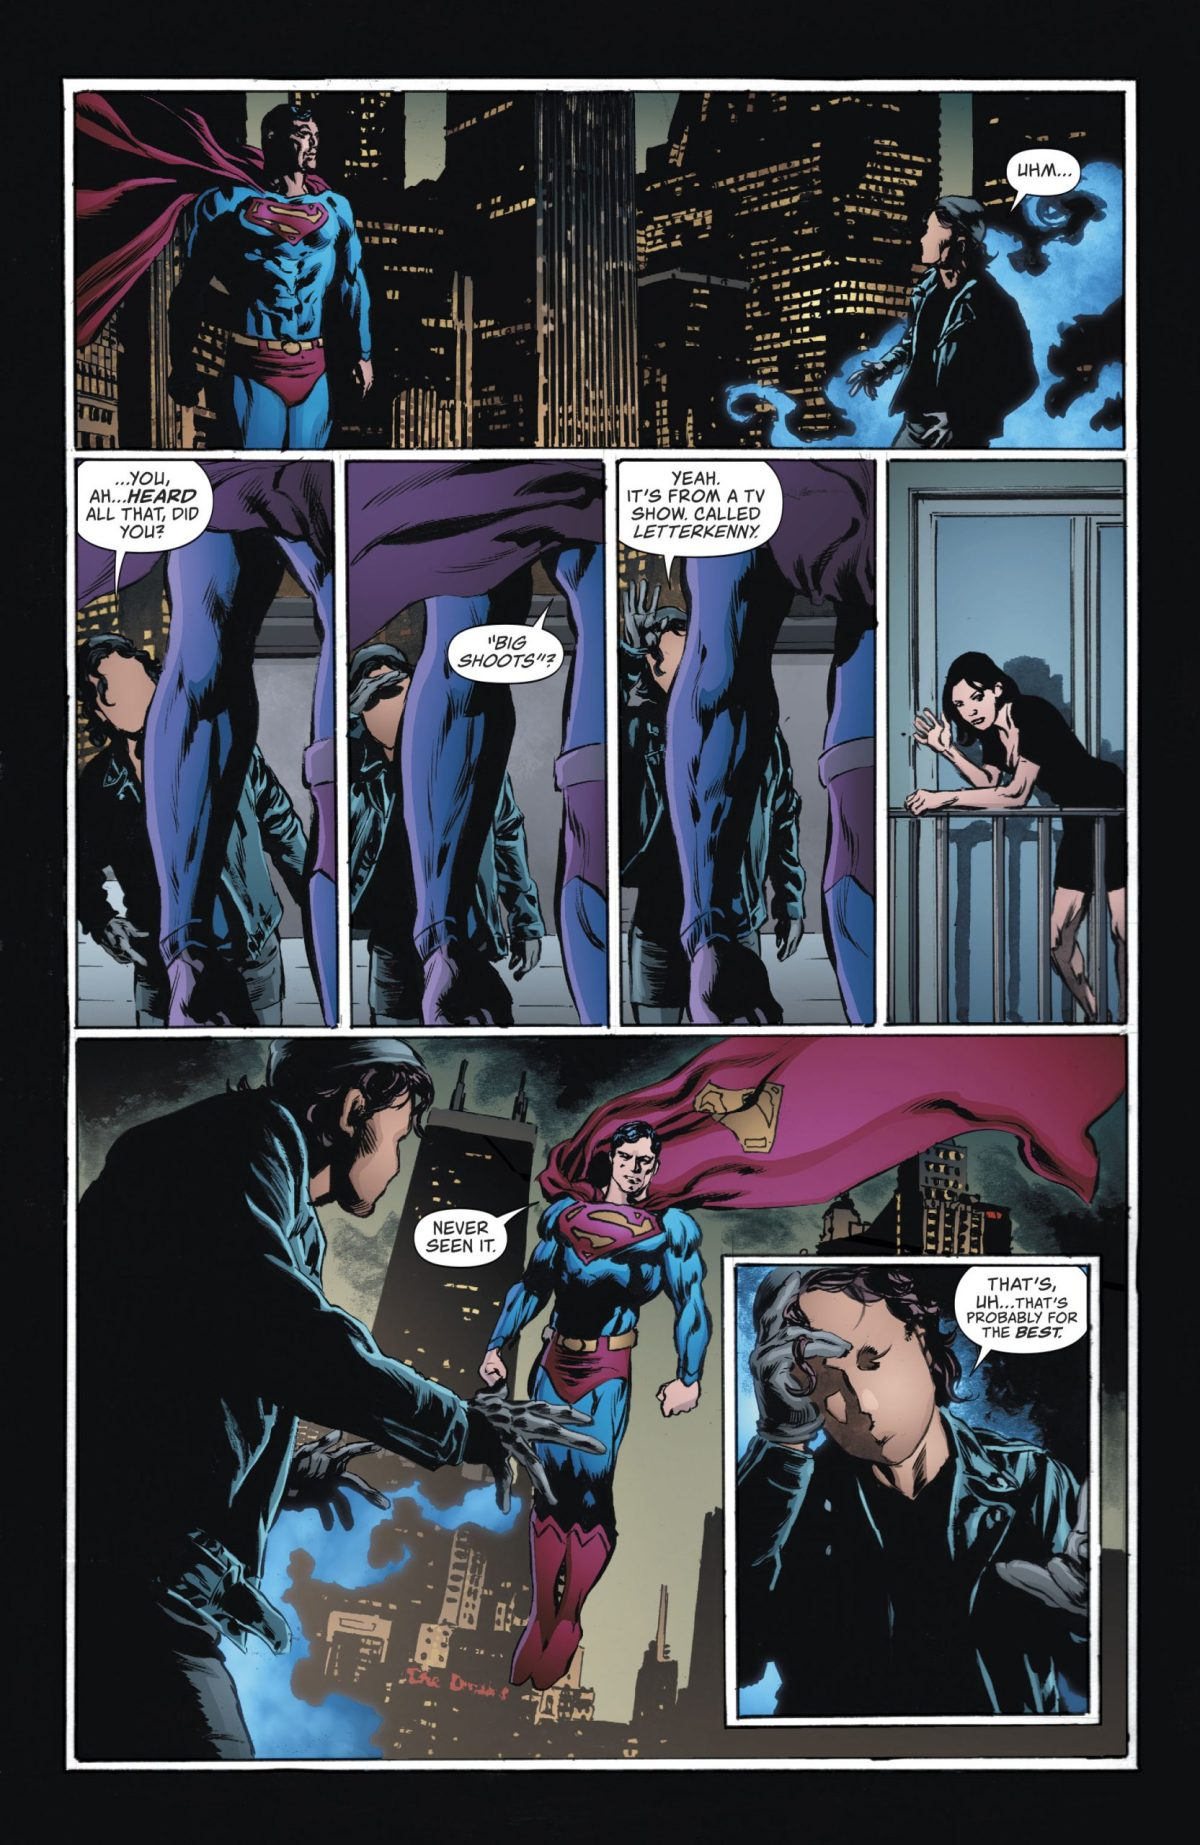 Renee meets Superman